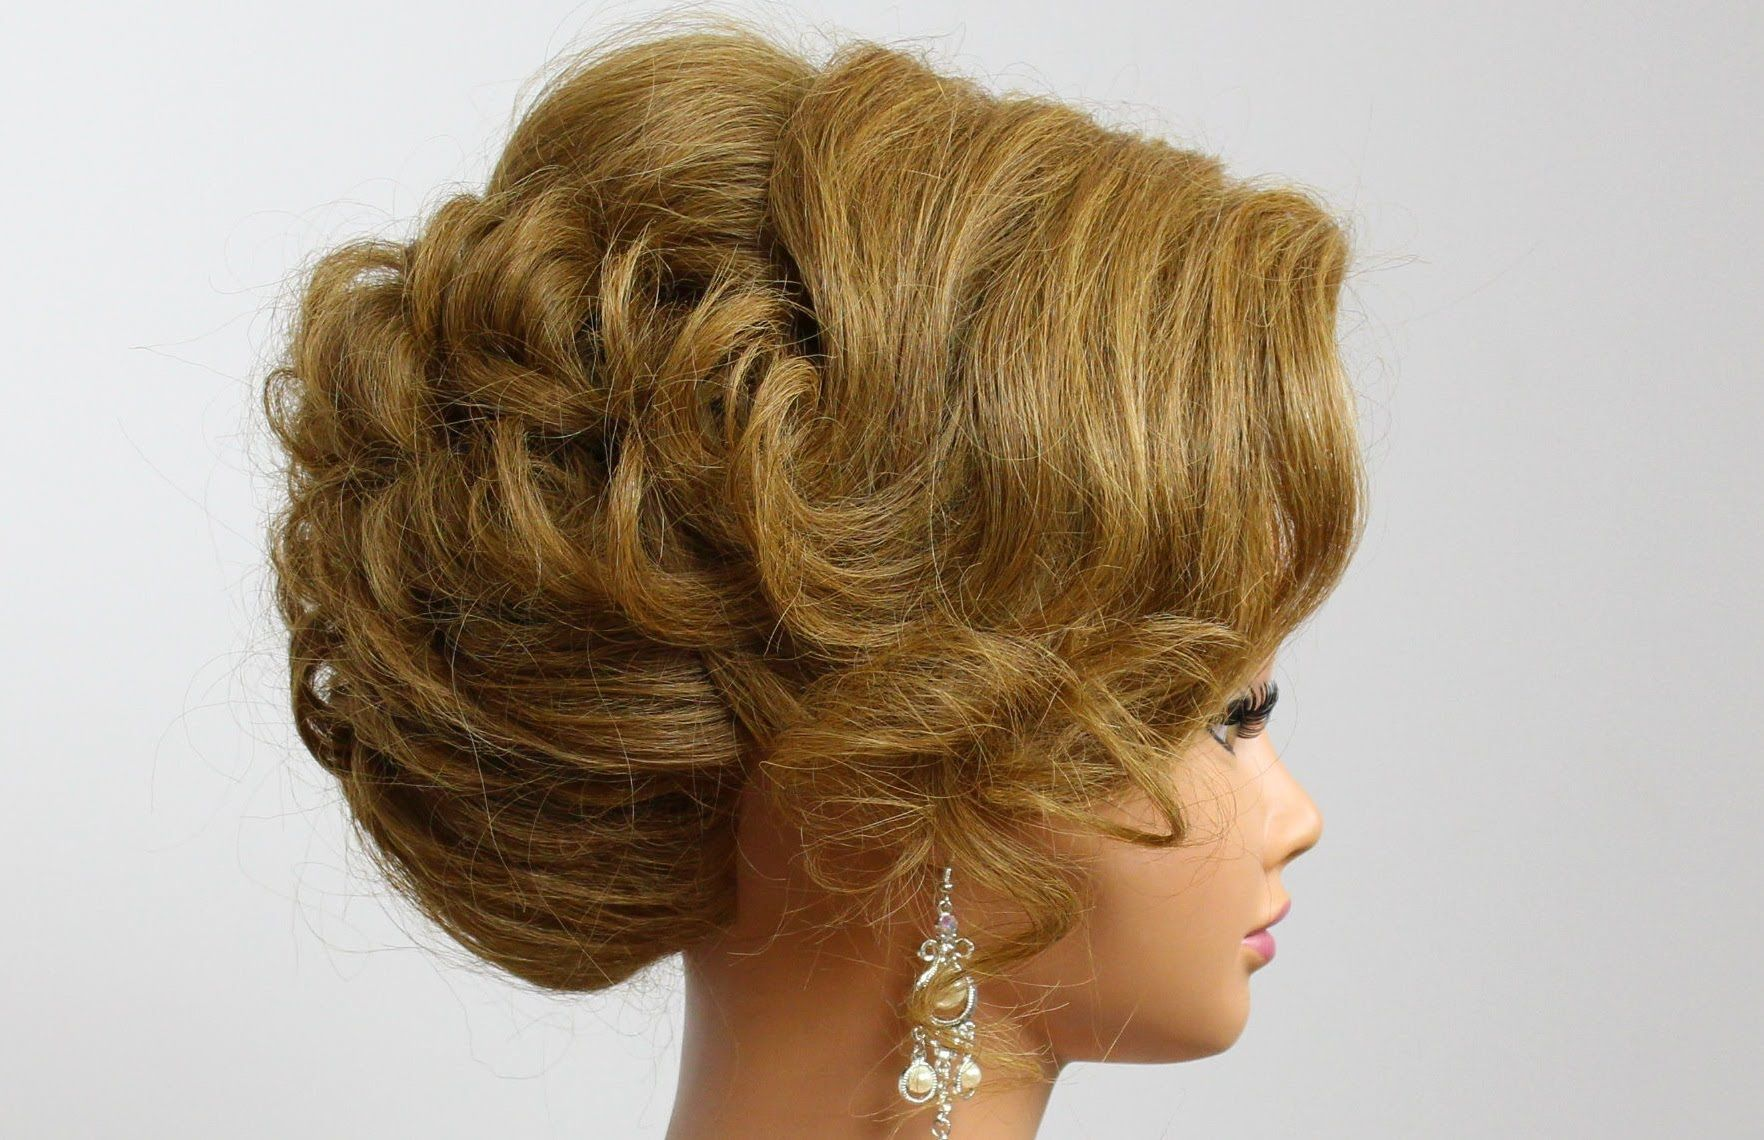 Bridal updo Wedding hairstyle for medium hair Hair